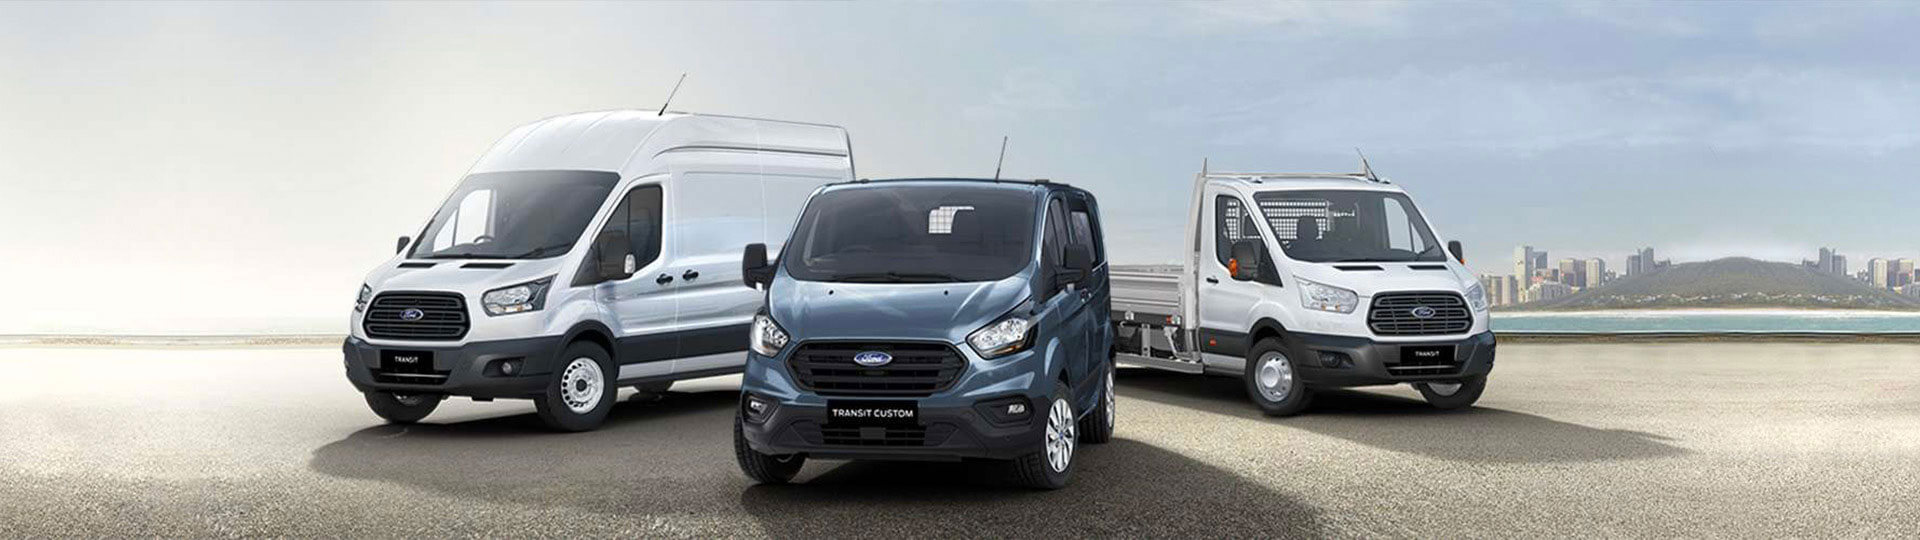 9cfce0bd1e Ford Fleet Wollongong - Gateway Ford